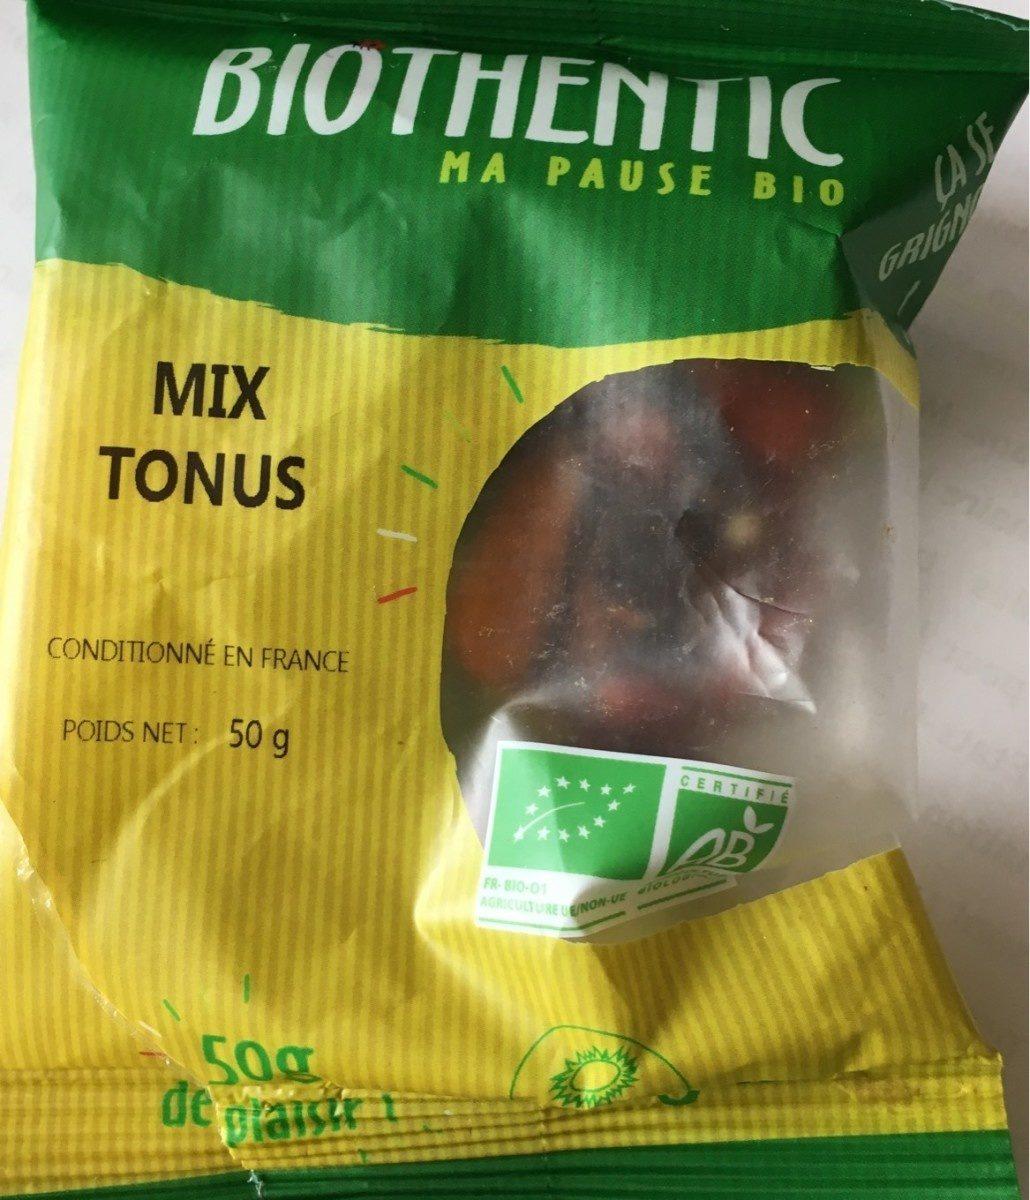 Mix Tonus - Product - fr